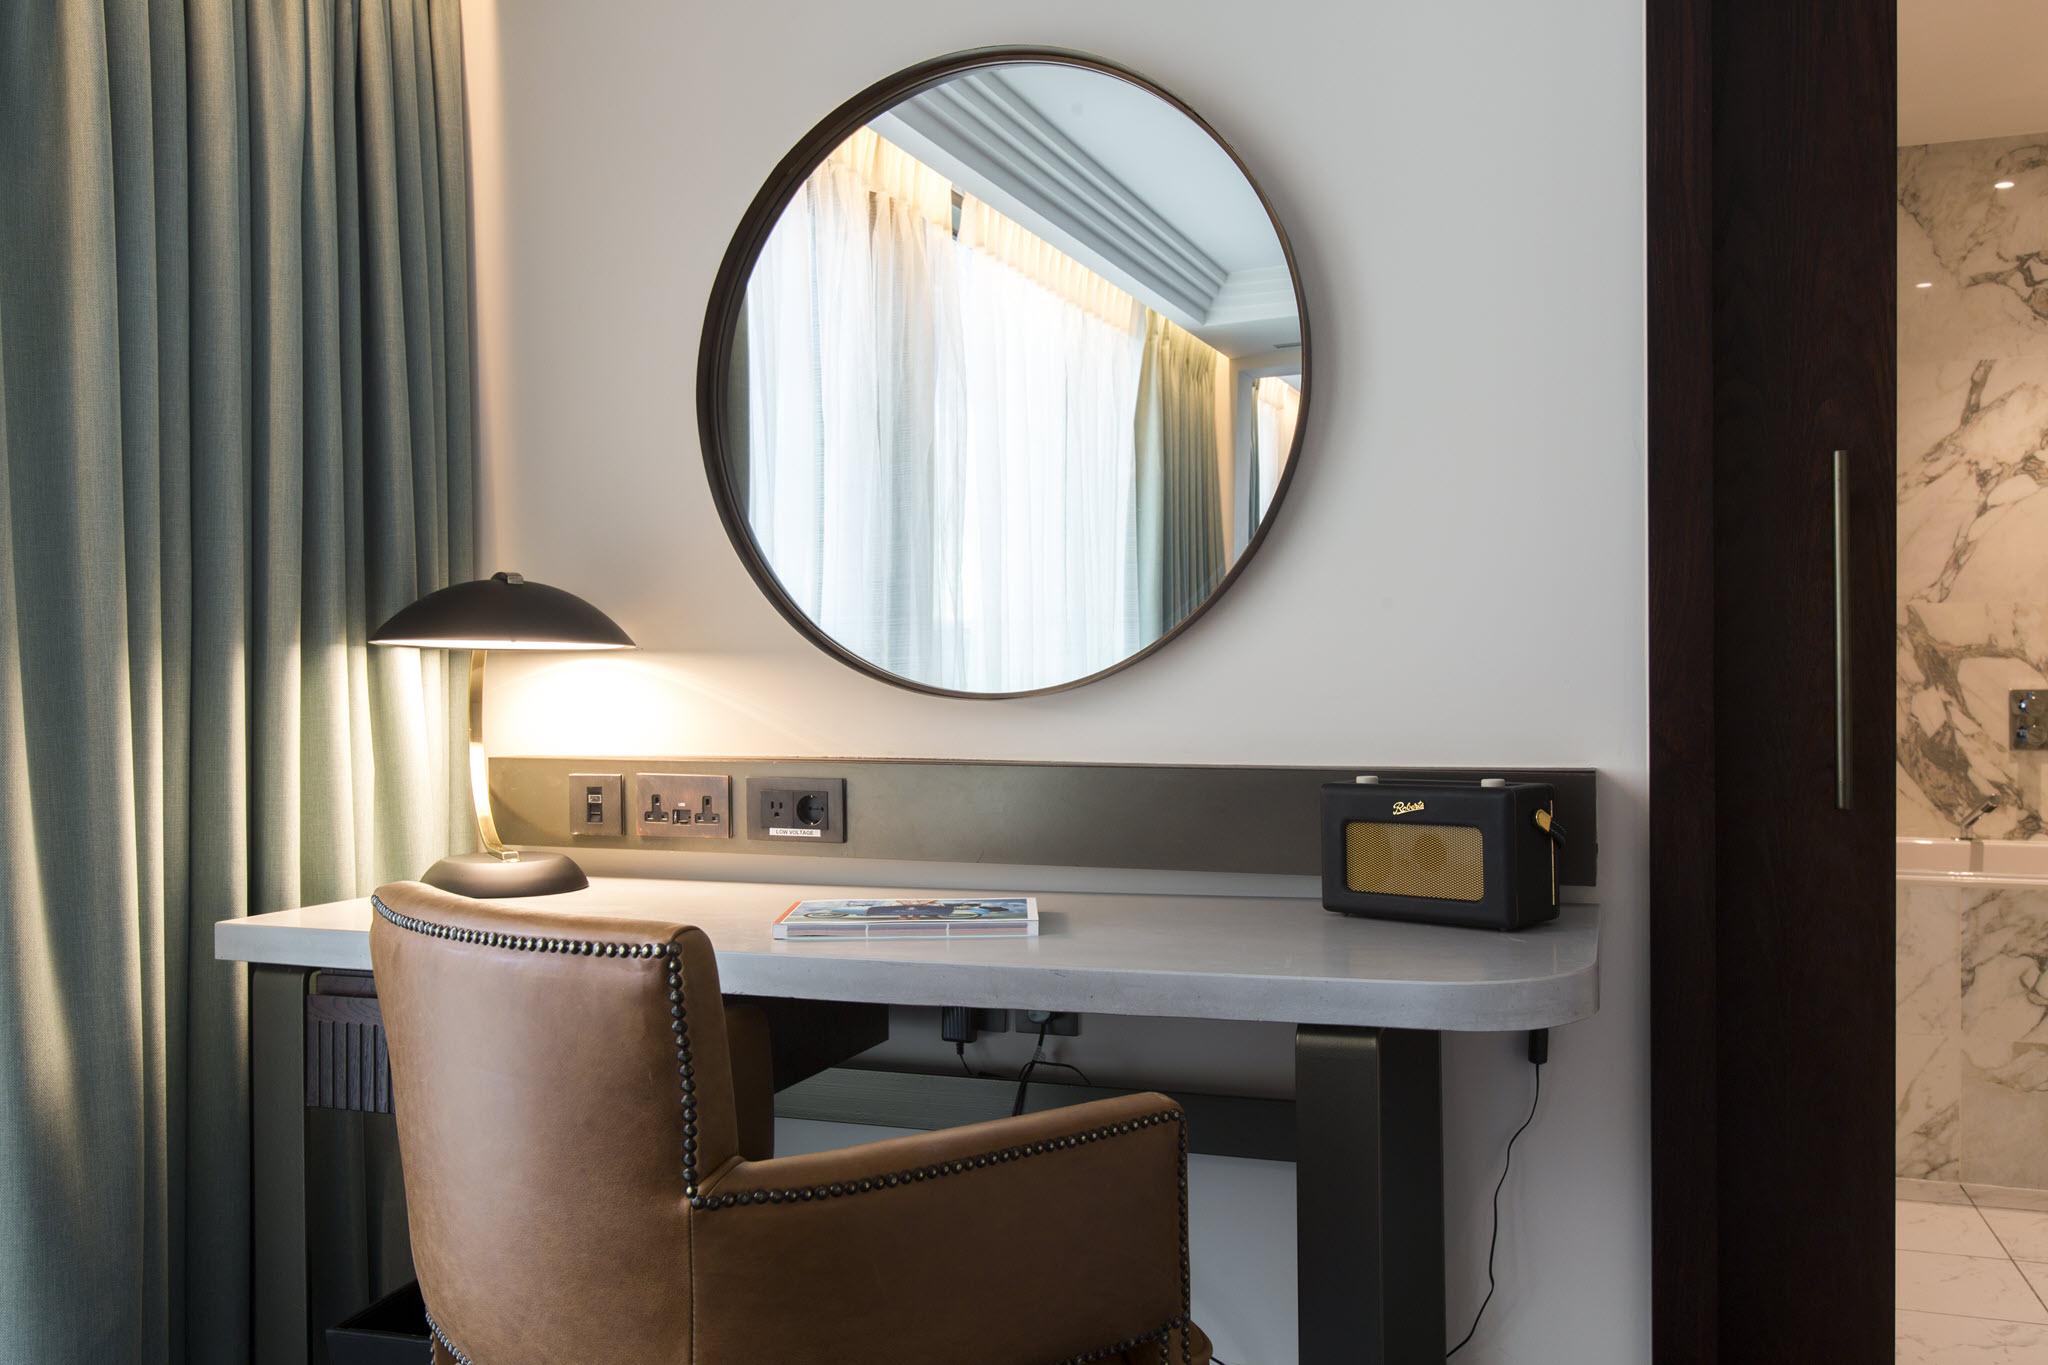 rooms at clayton hotel cambridge